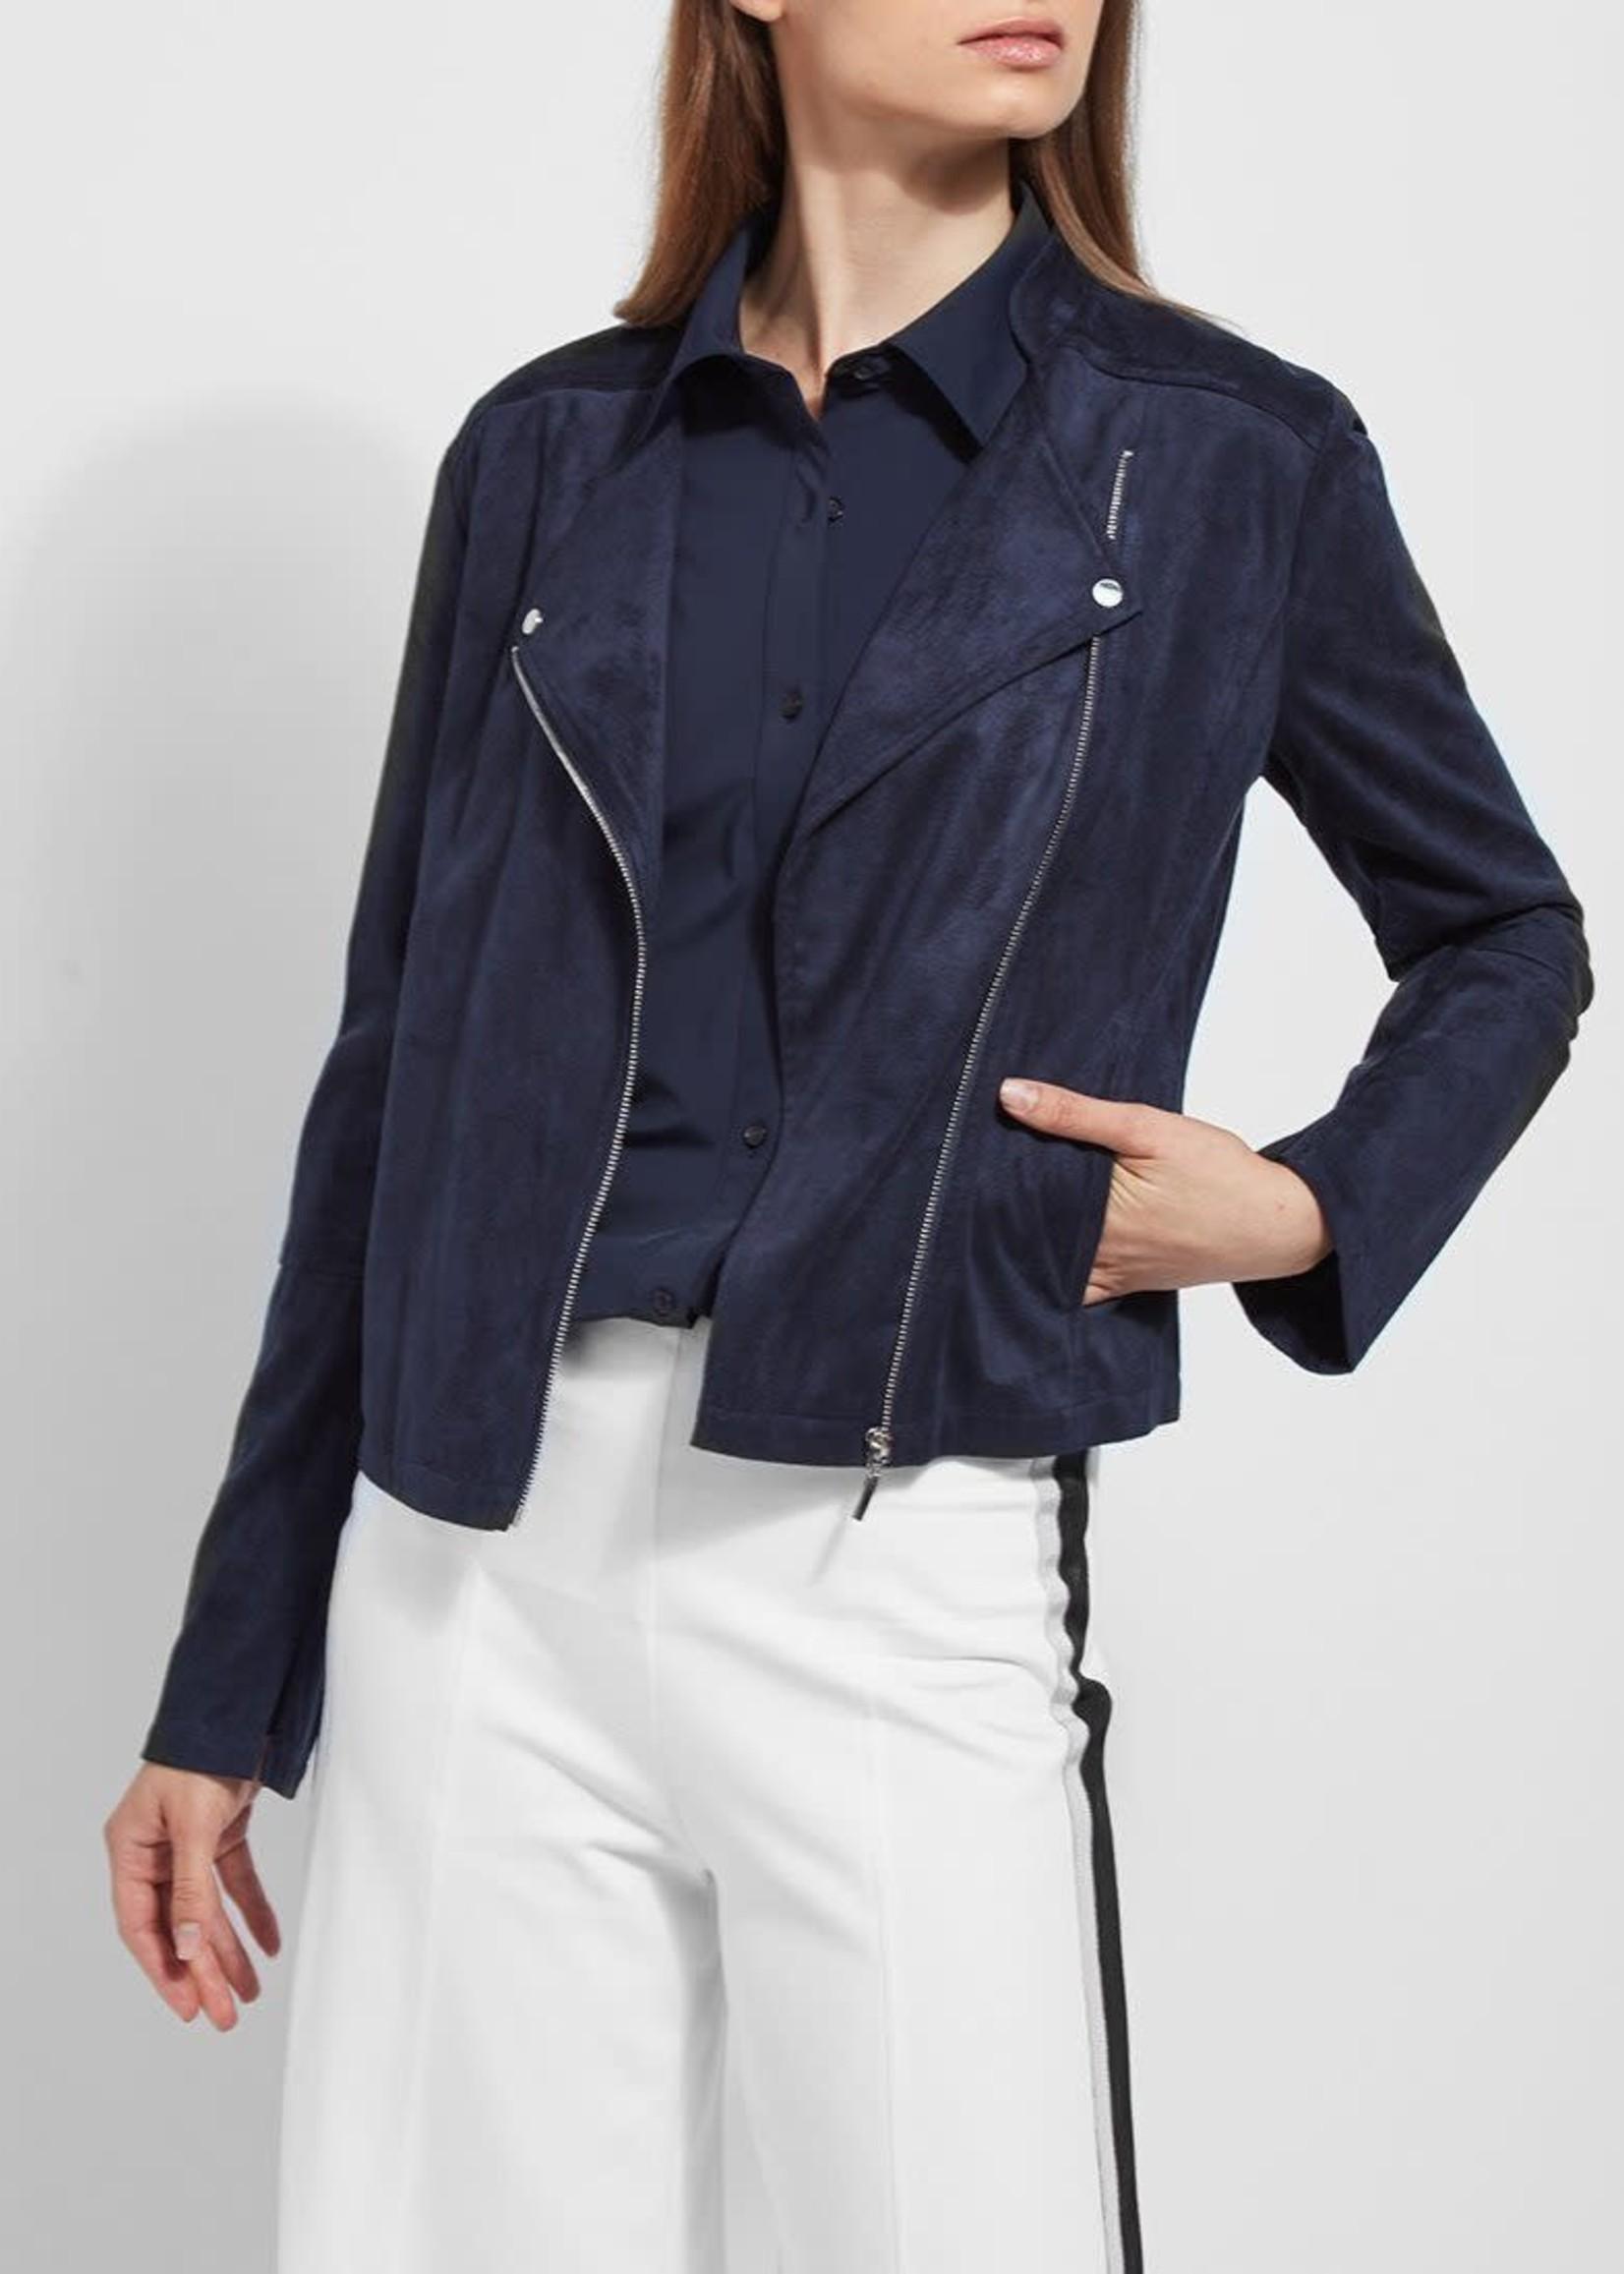 Essential Suede Jacket